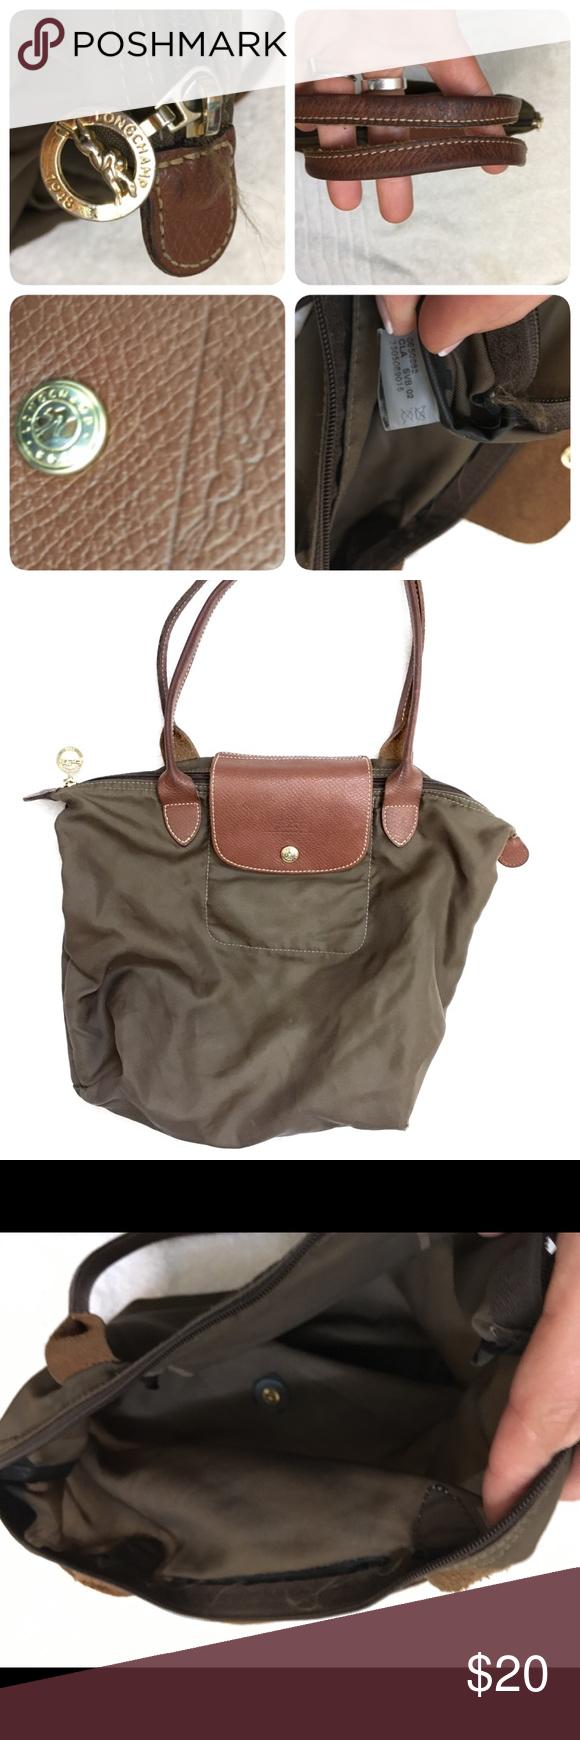 237f6bedce0c Longchamp Le Pliage Nylon Shopper Medium Brown This is a brown dark olive  green Le